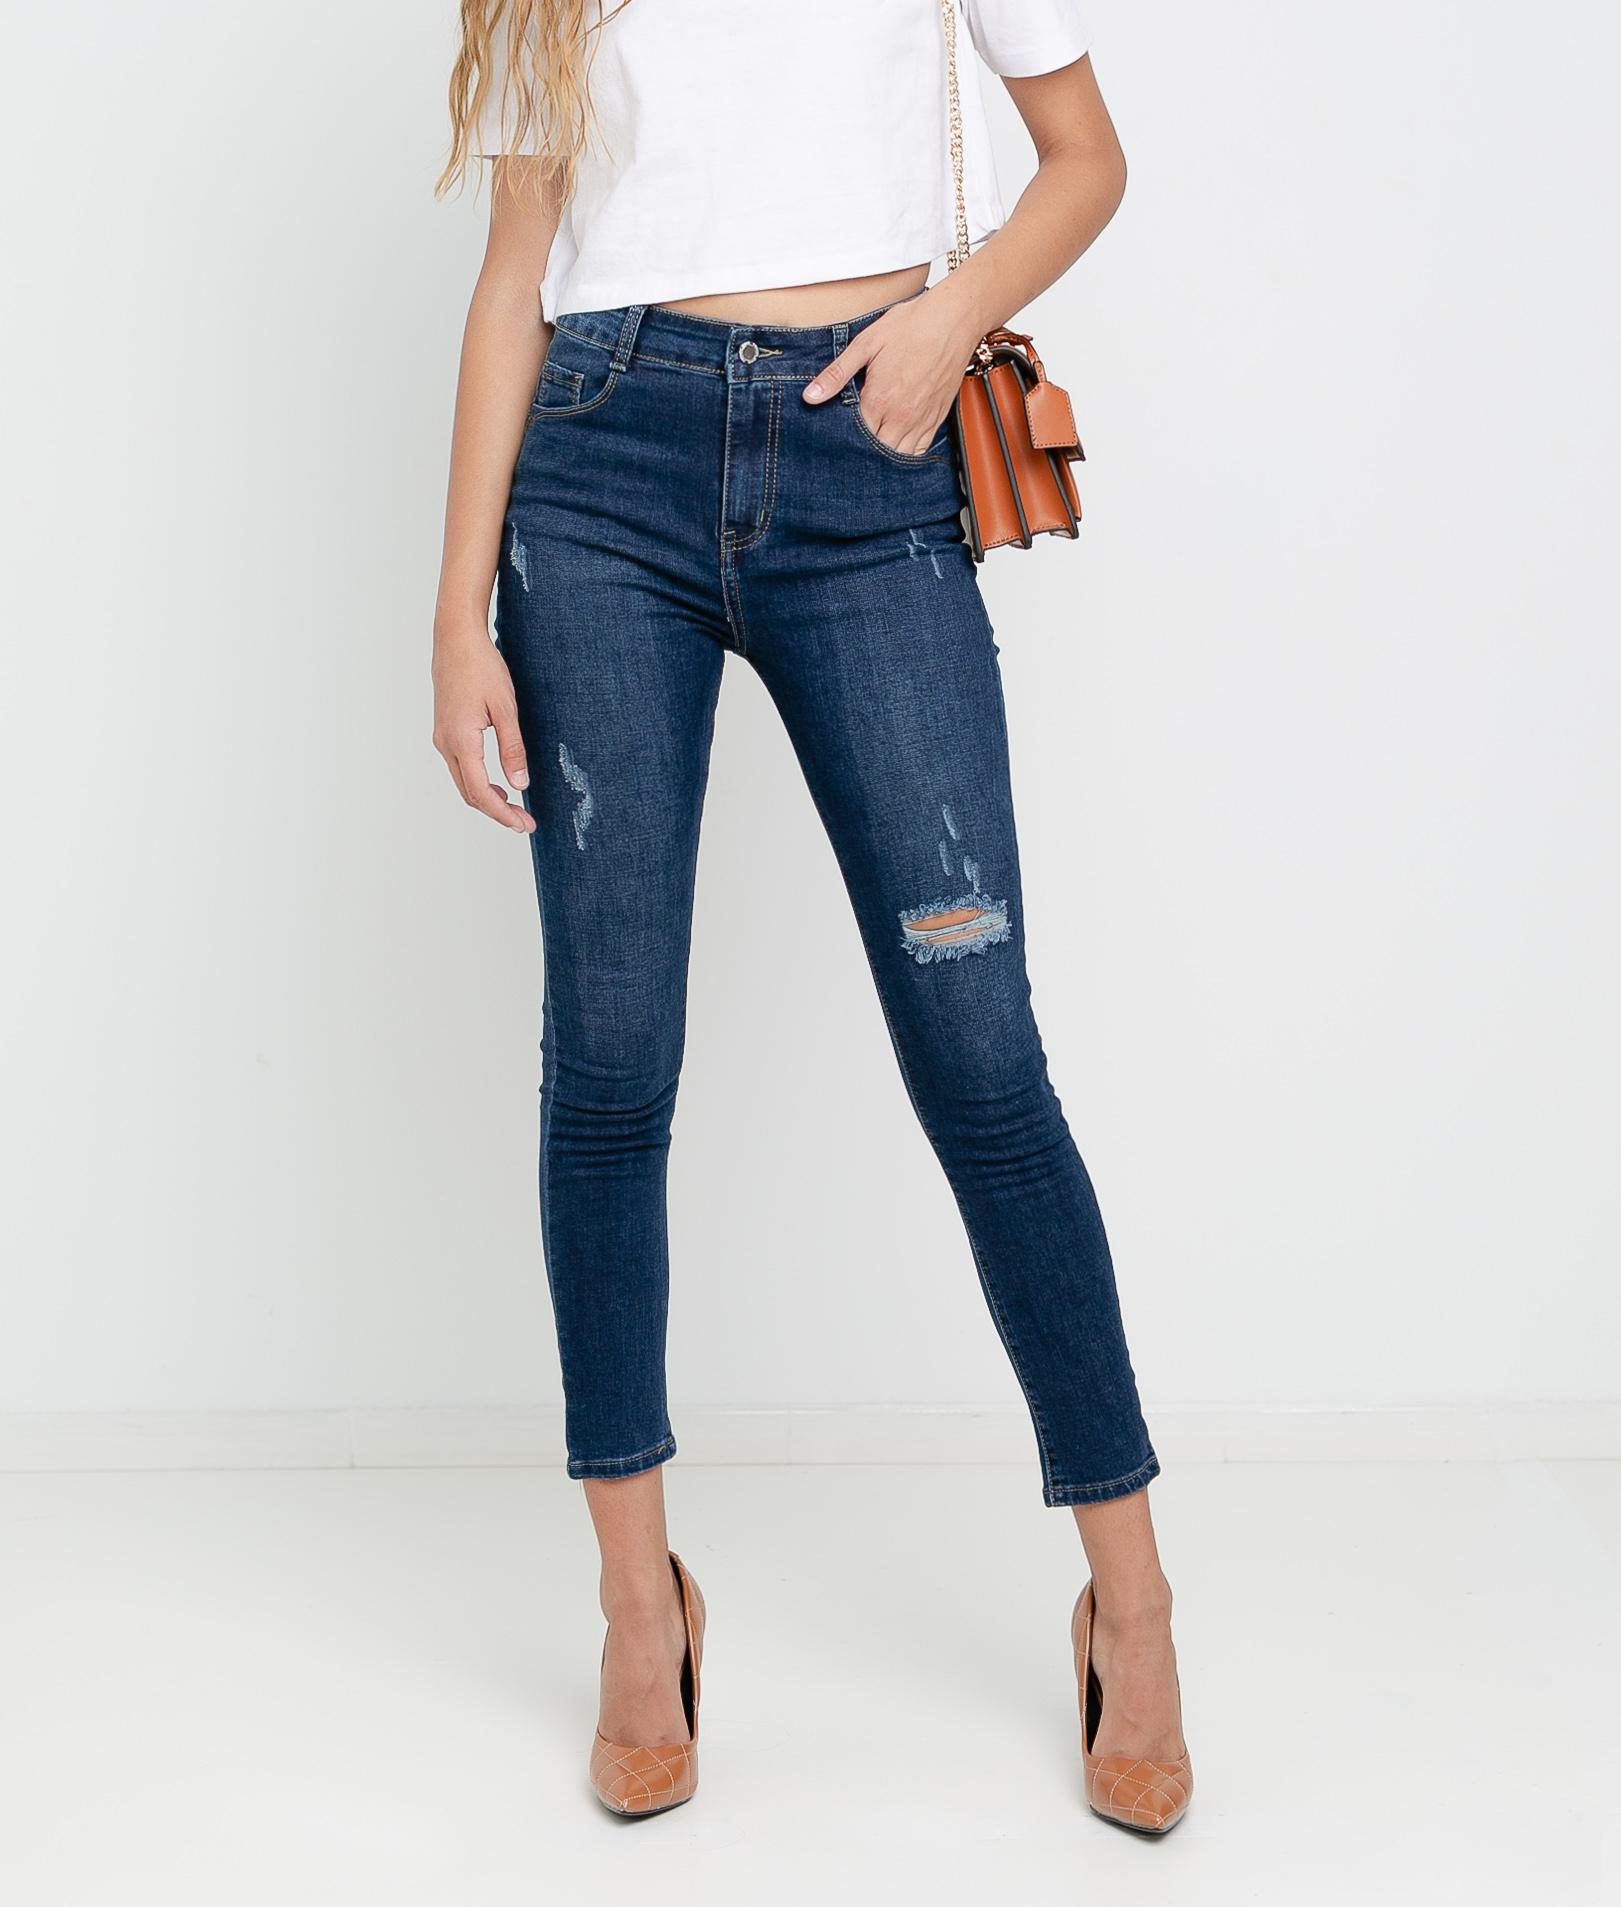 Trousers Borie - Denim